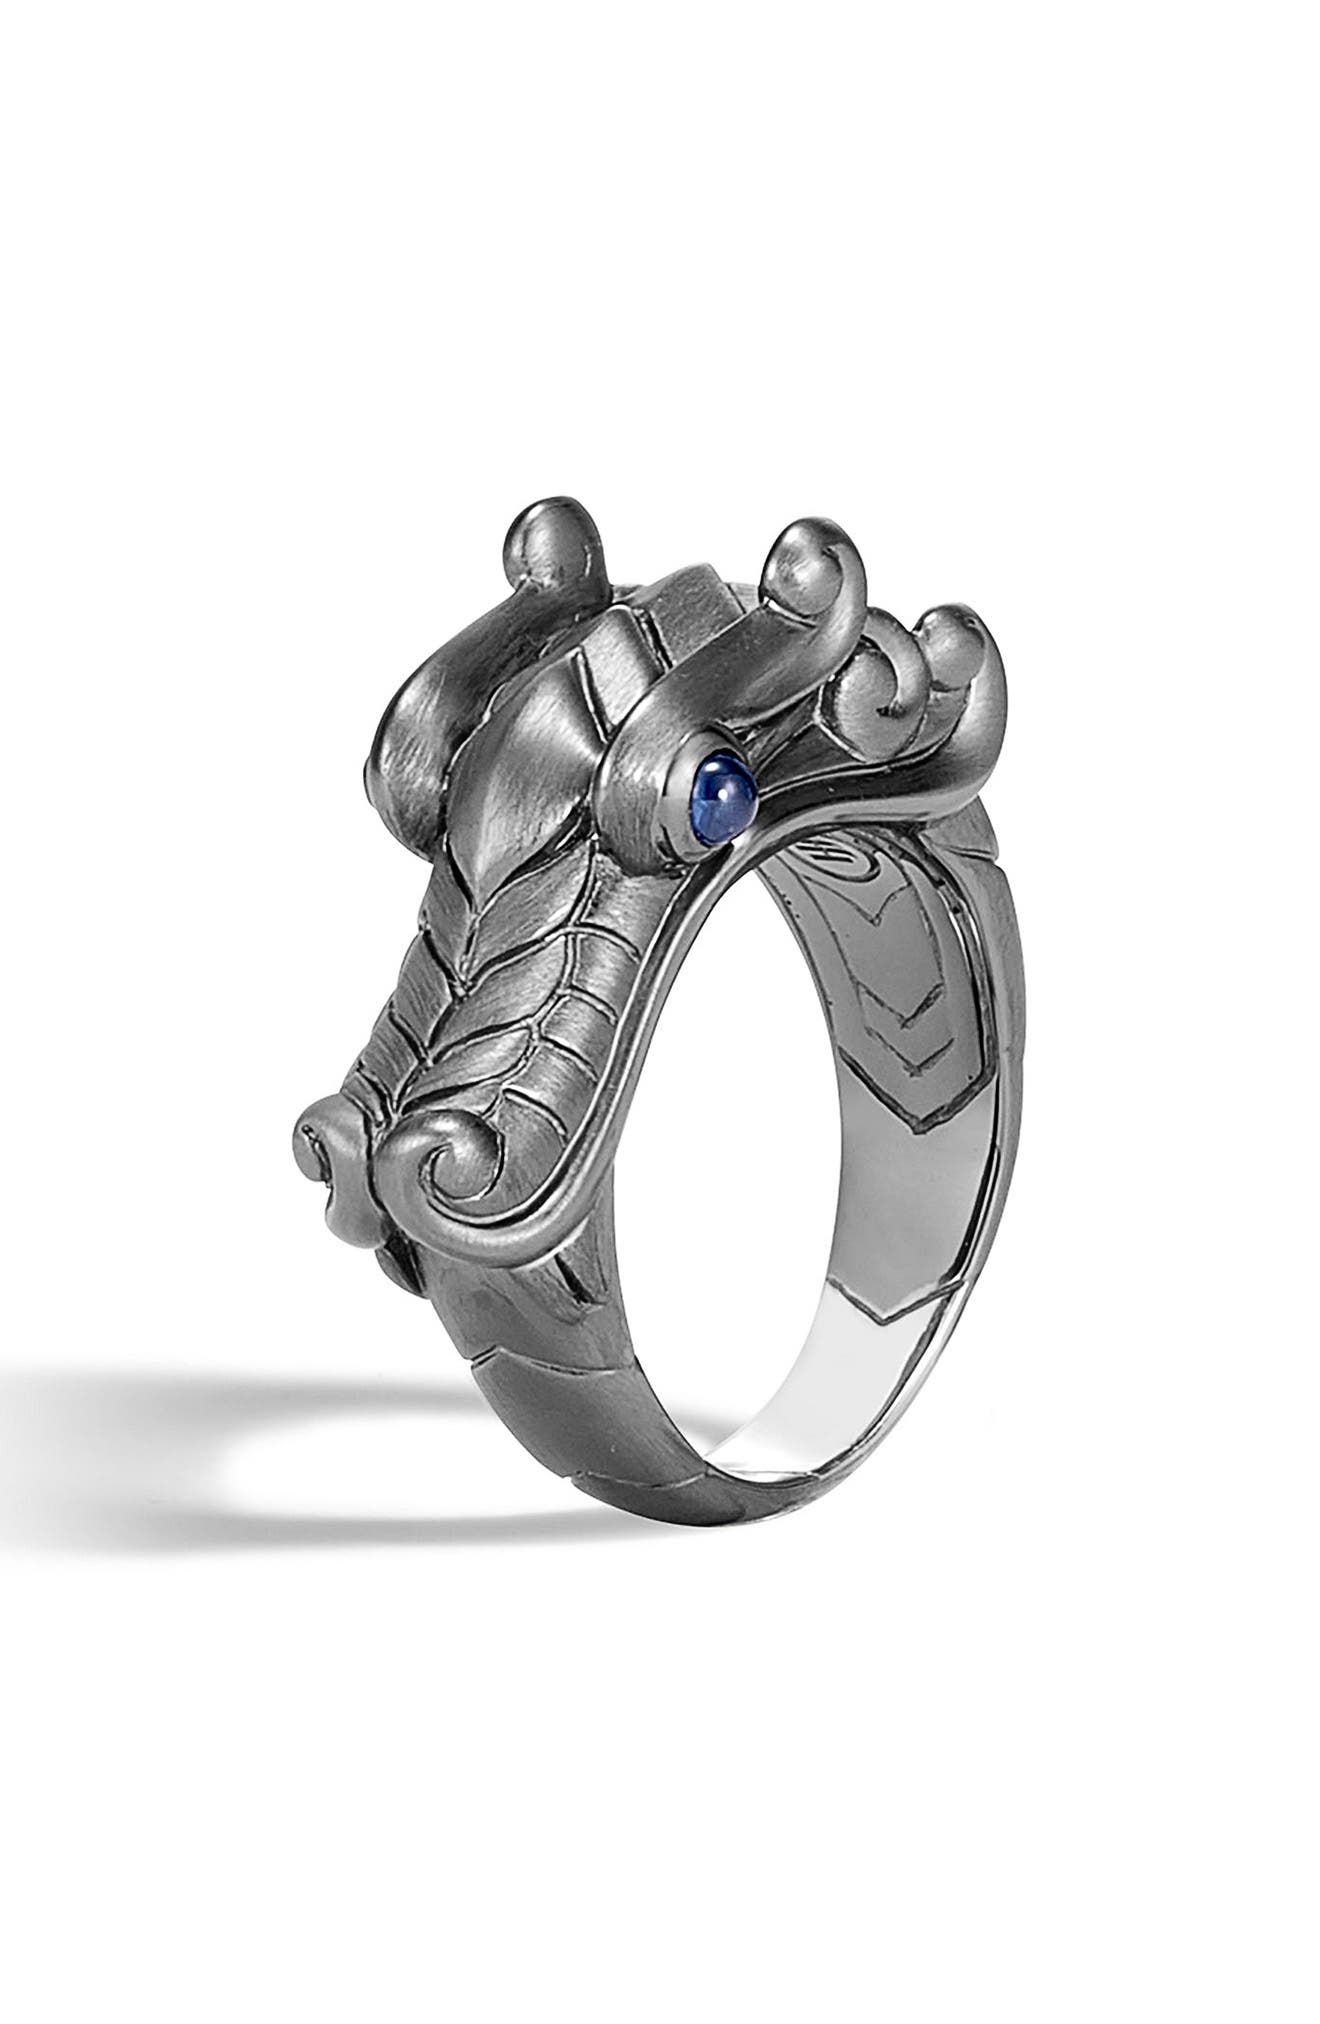 Men's Legends Naga Ring,                         Main,                         color, SILVER/ BLACK RHODIUM